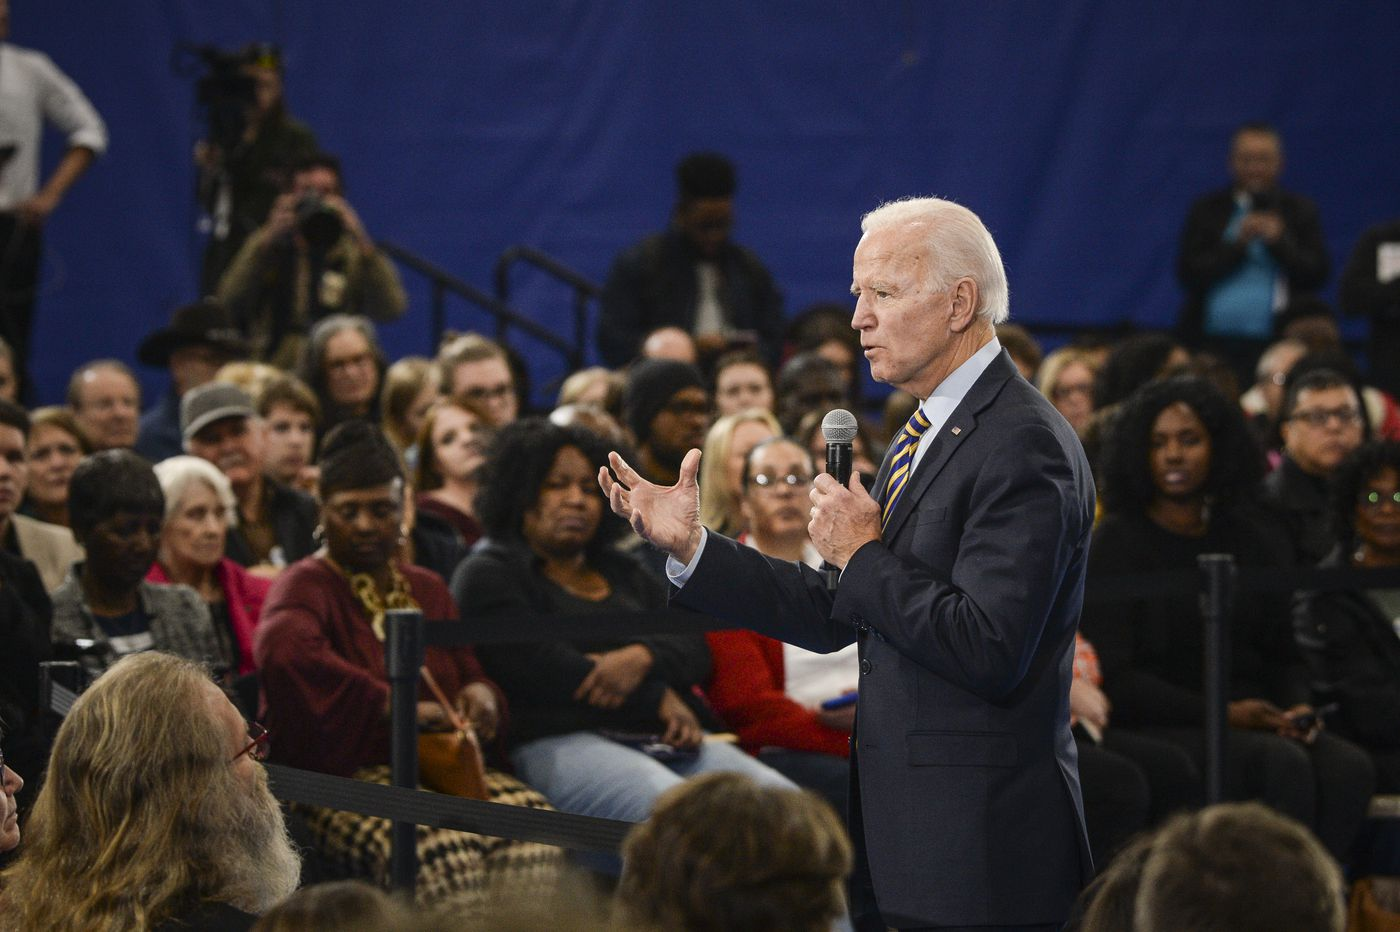 Joe Biden is losing ground in the 2020 Pennsylvania primary, poll says